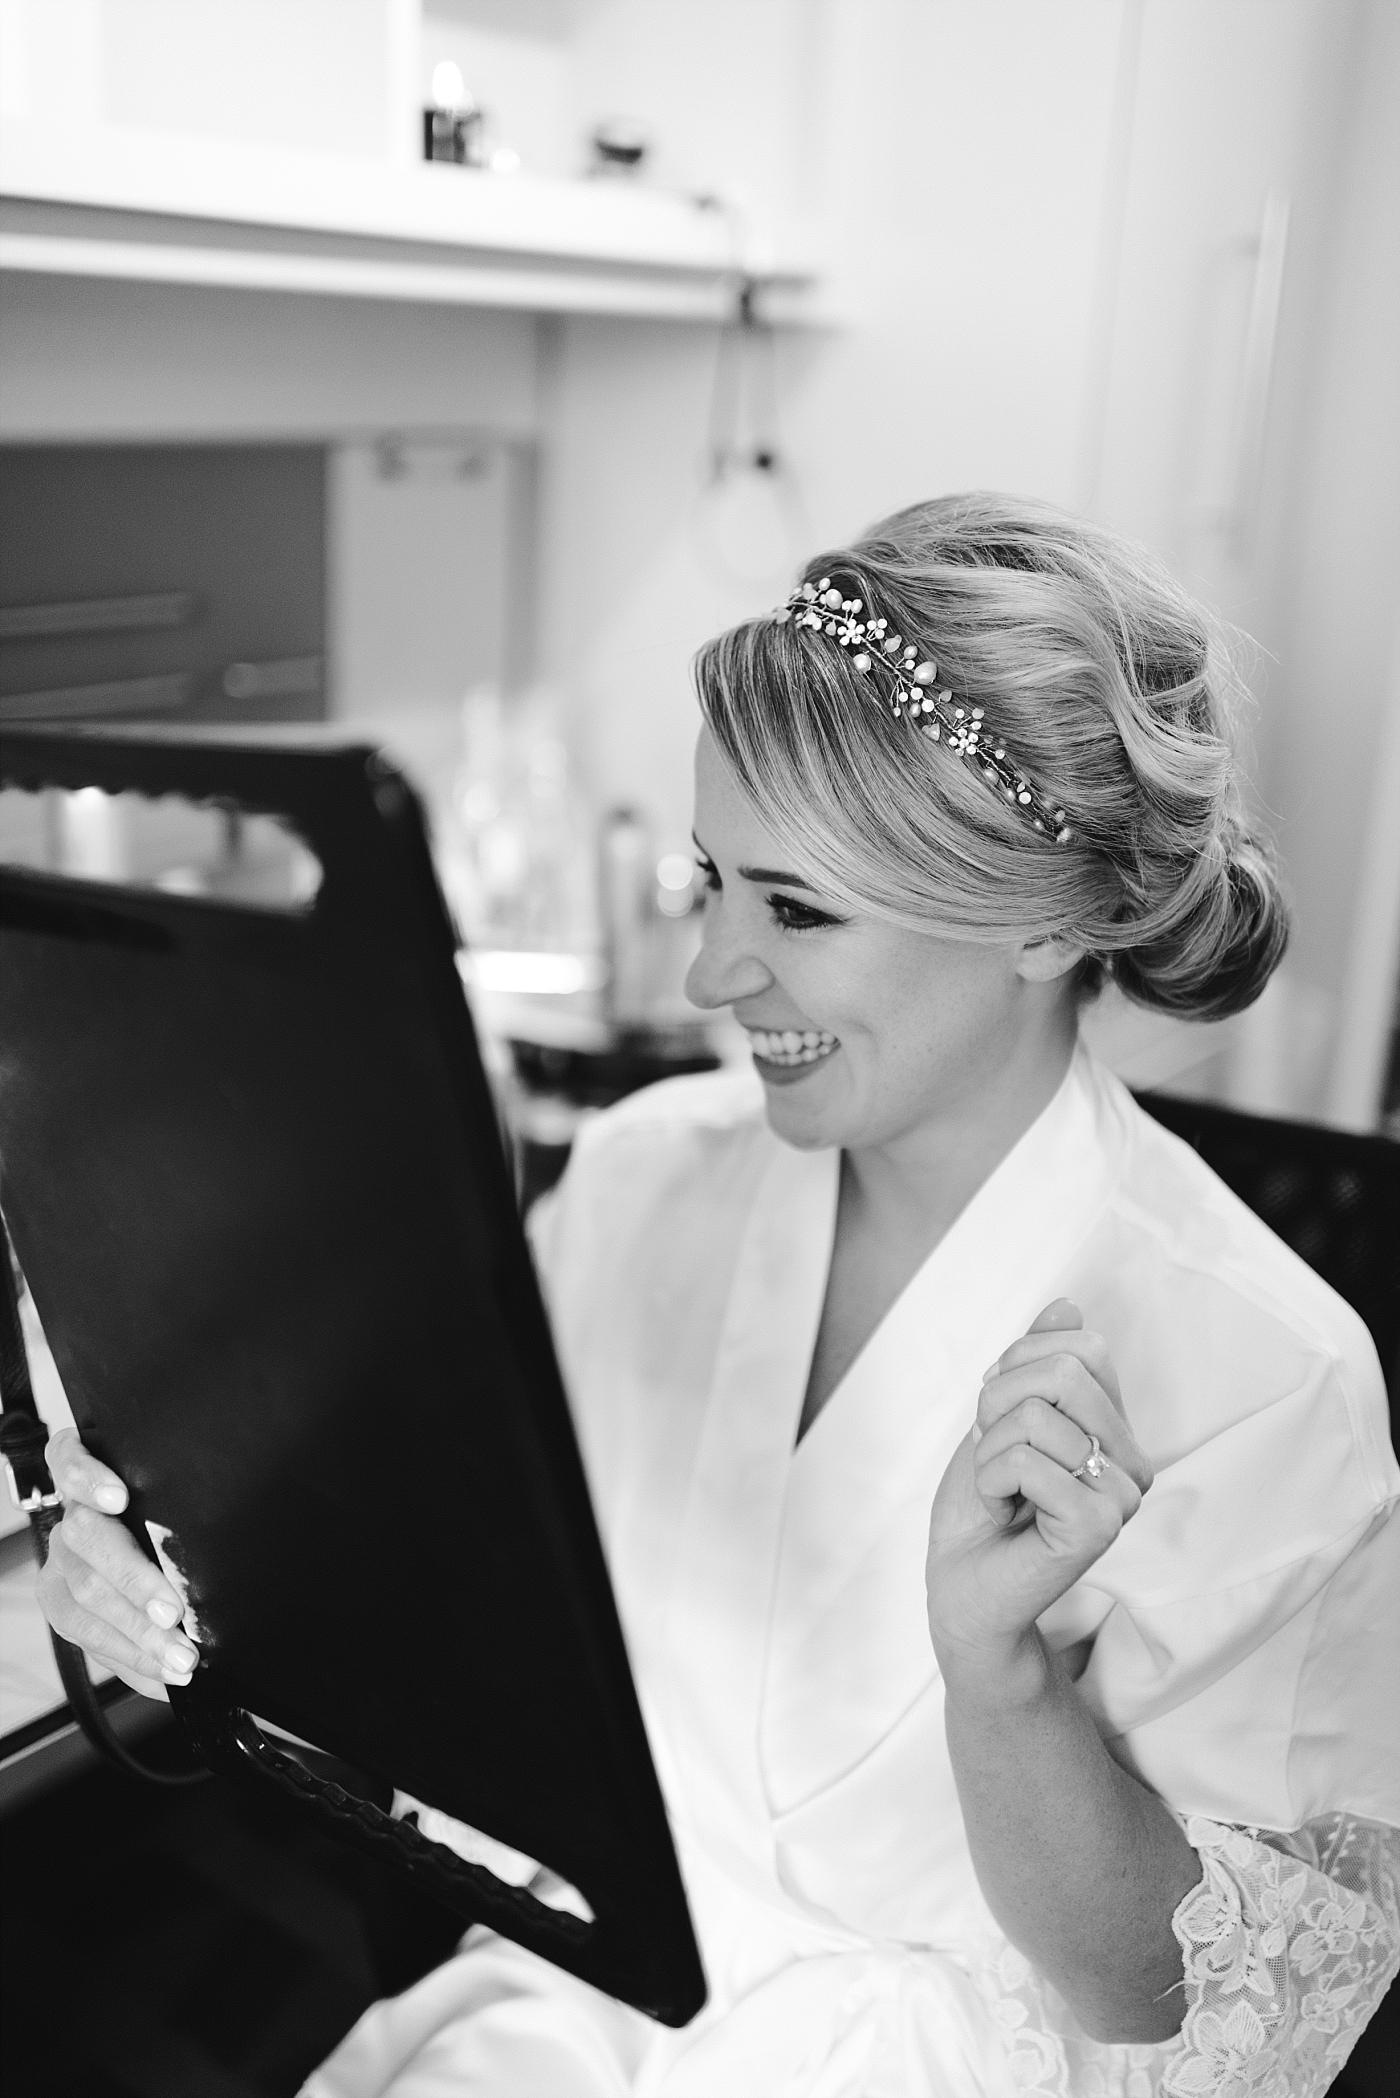 Glam bride updo bridal wedding details